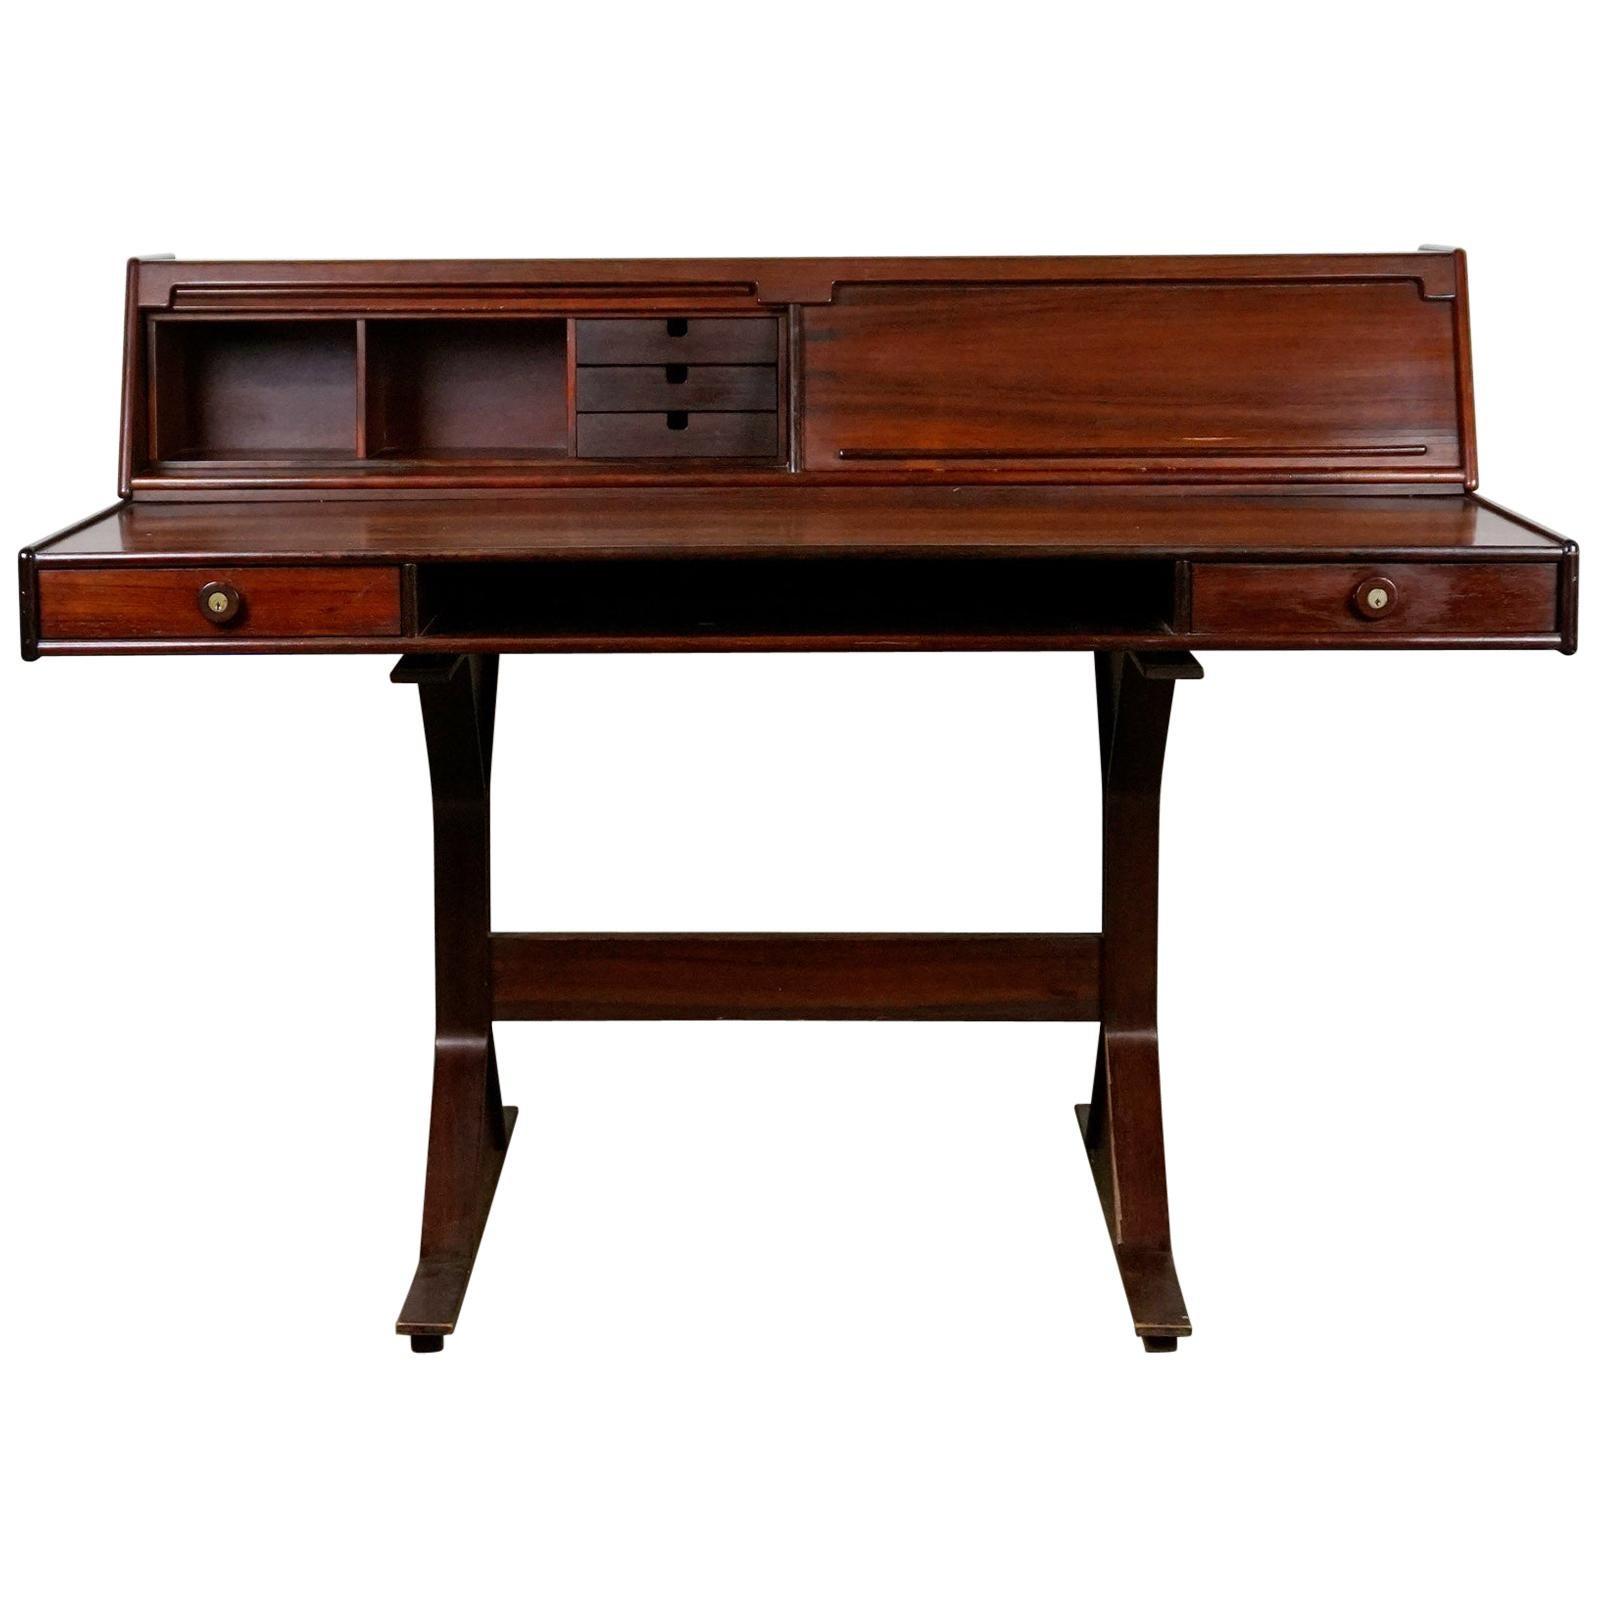 Italian Midcentury Rosewood Desk Mod. 530 by Gianfranco Frattini for Bernini